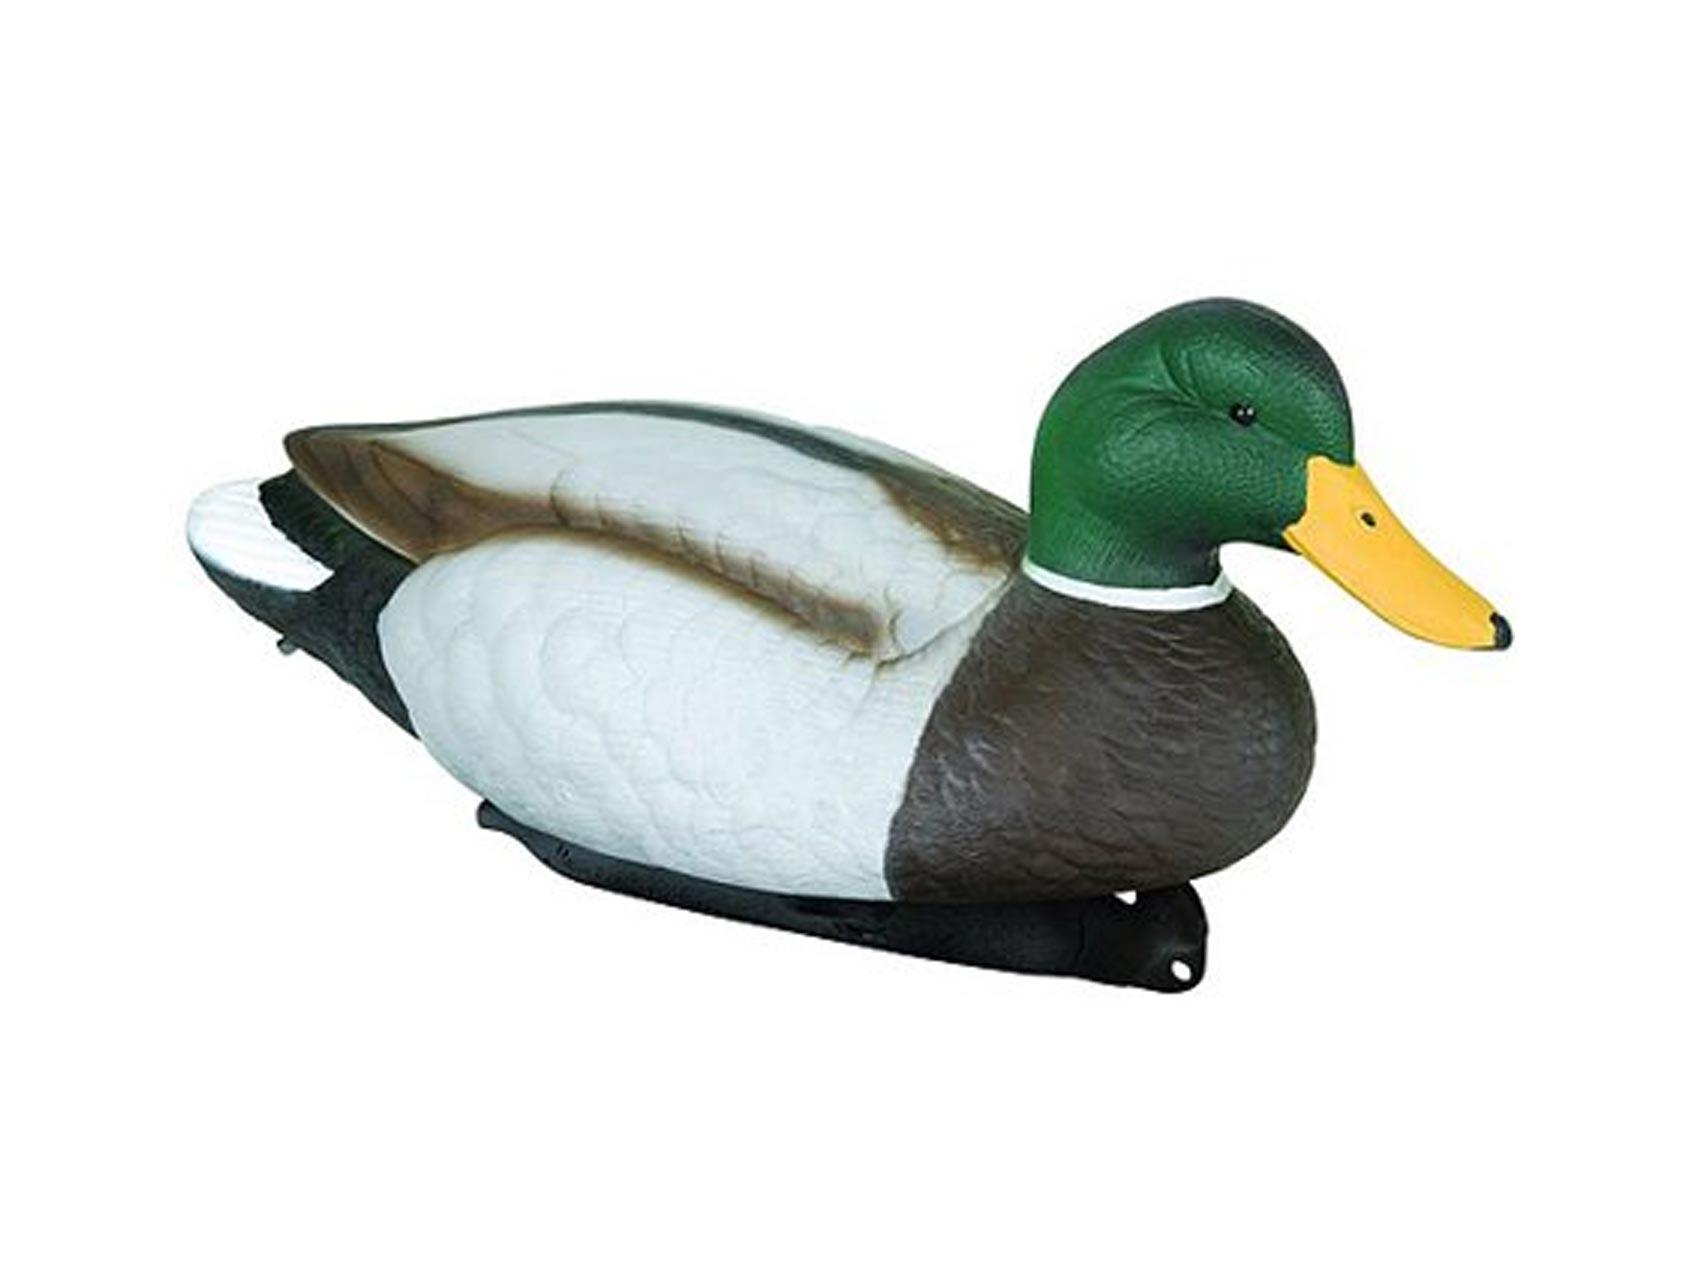 Mallard duck decoy